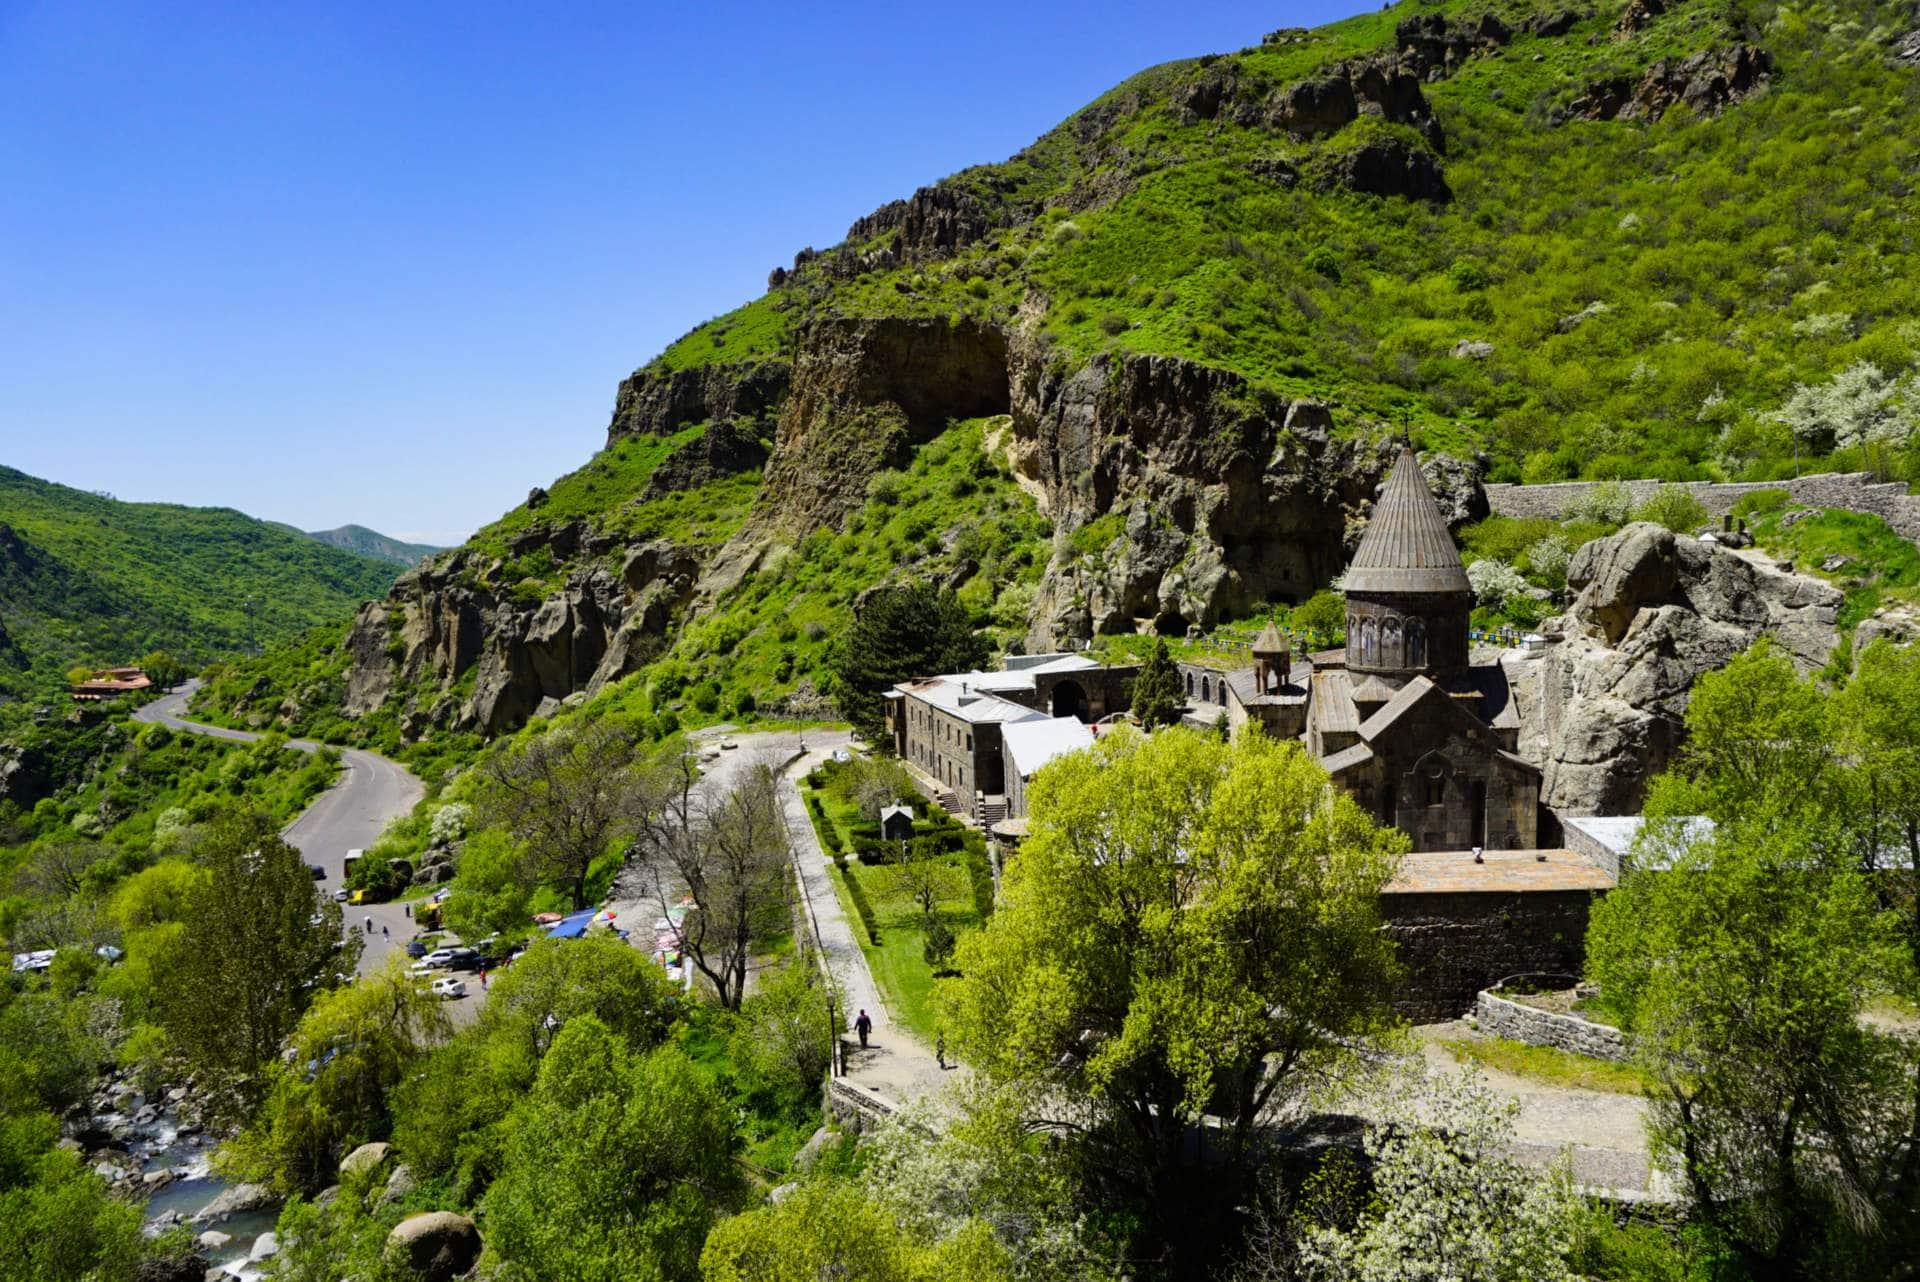 Geghard monastery, Armenia - Experiencing the Globe